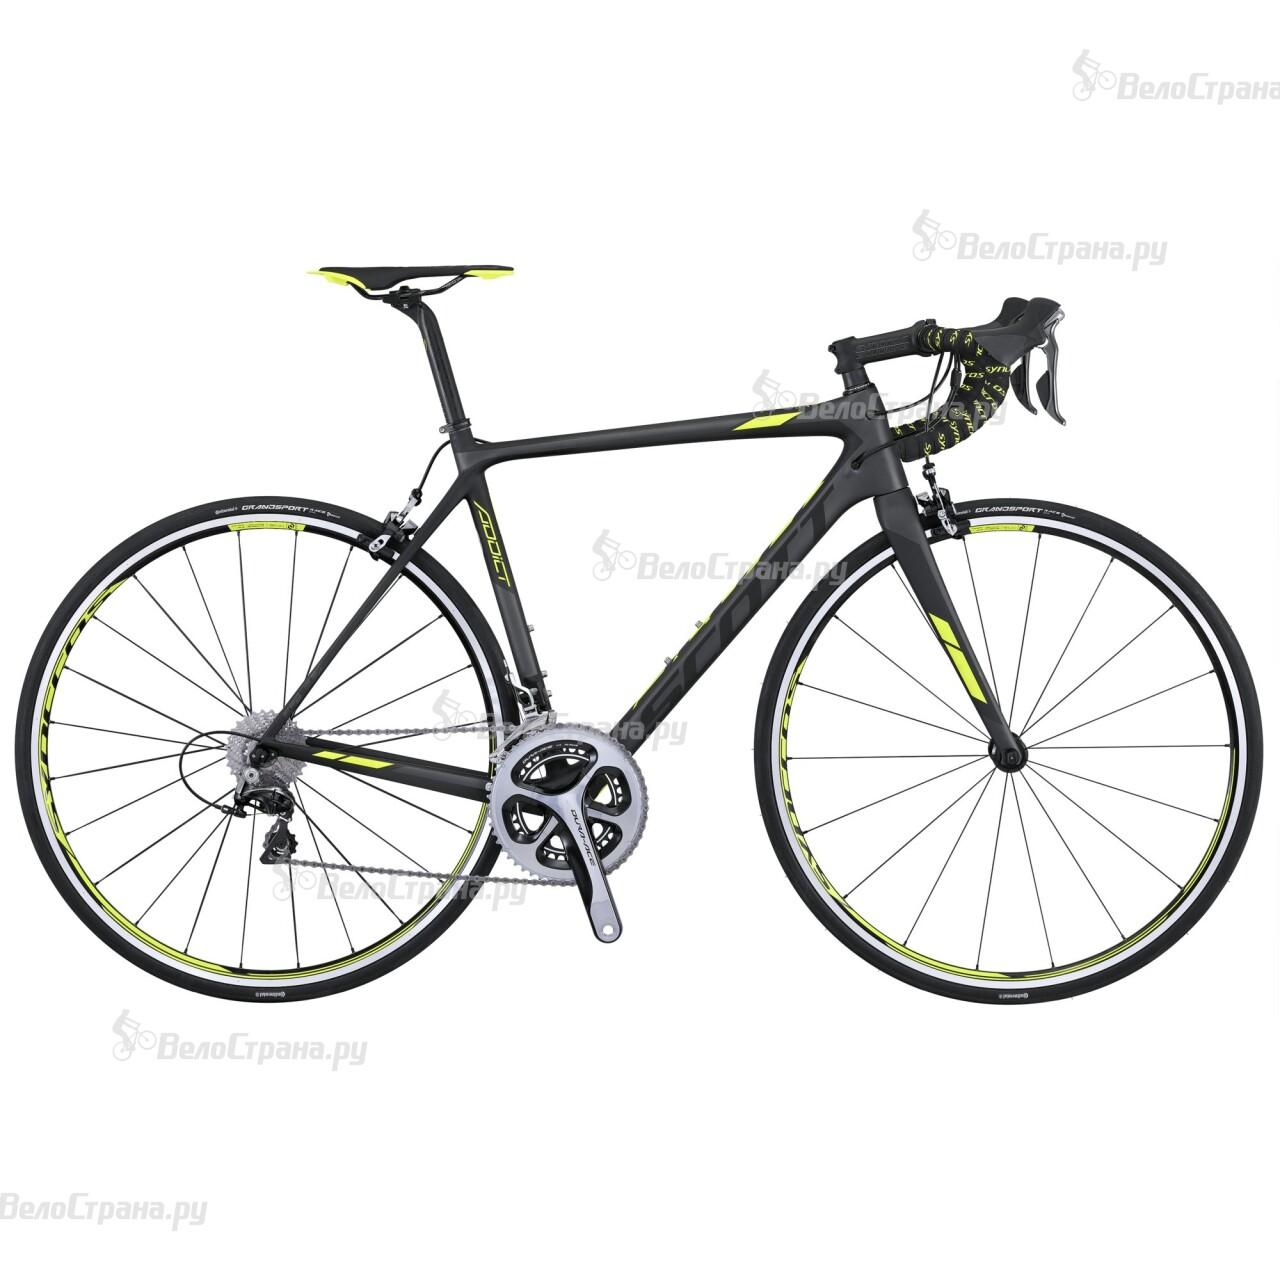 Велосипед Scott Addict 10 (2016) scott addict sl compact 2015